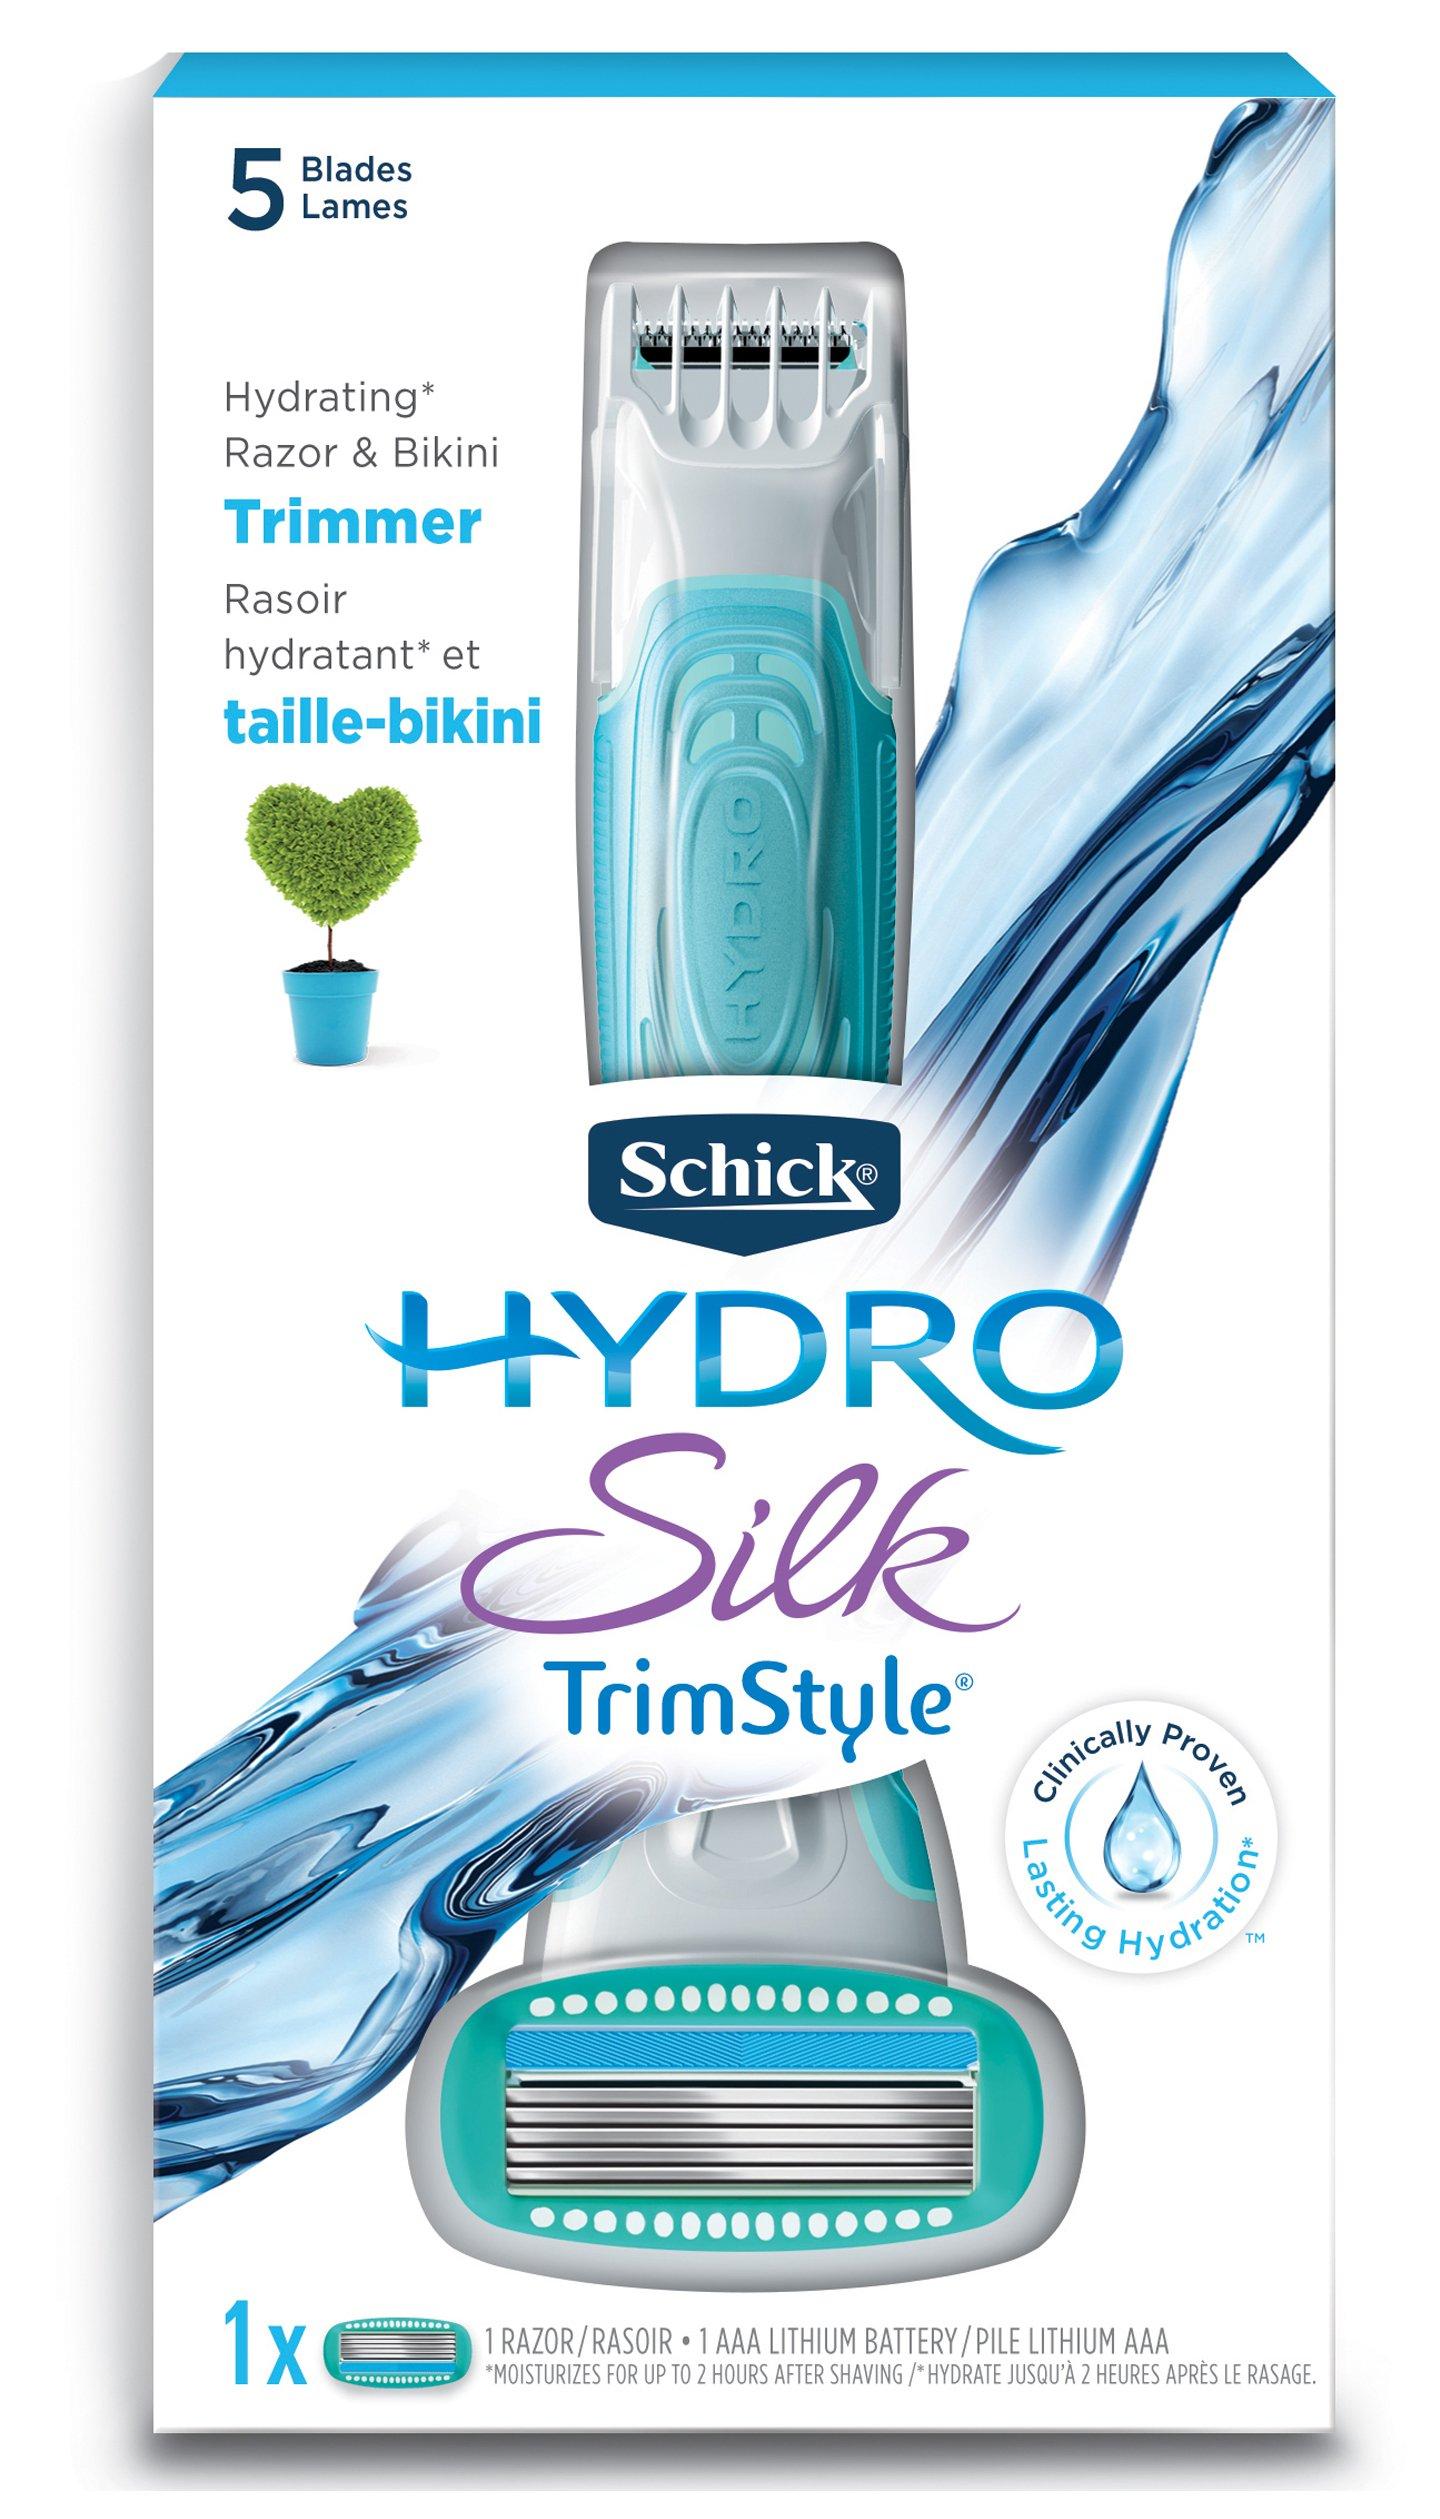 Schick Hydro Silk TrimStyle Moisturizing Razor for Women with Bikini Trimmer